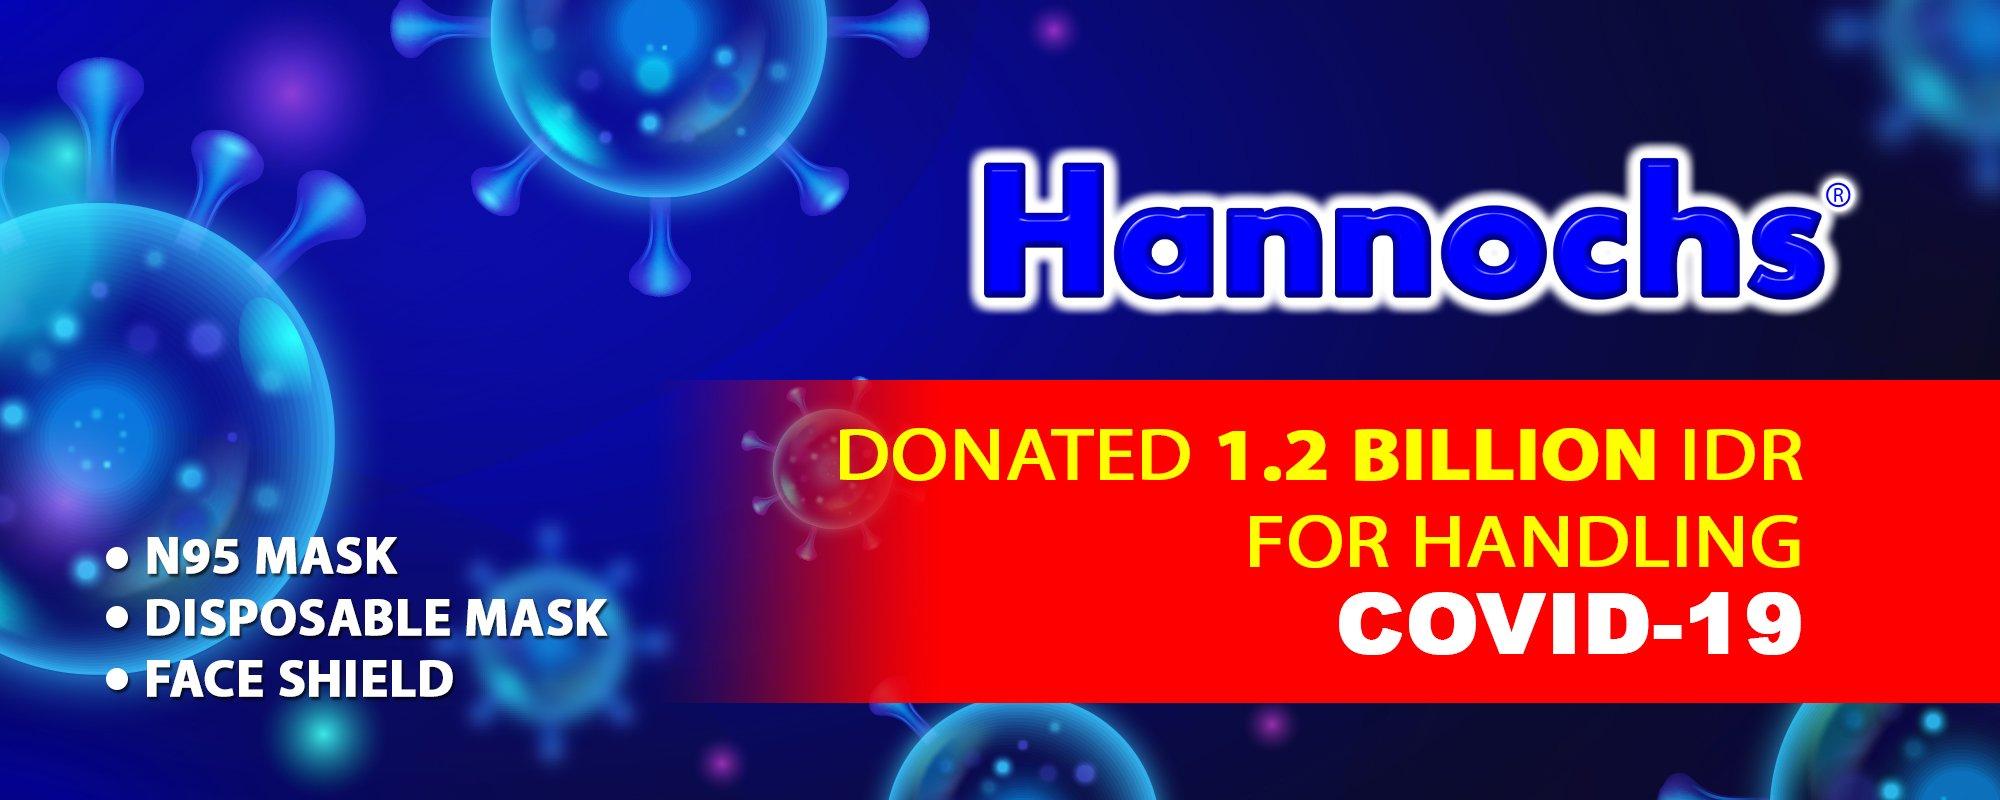 Hannochs Donate Desktop ENG